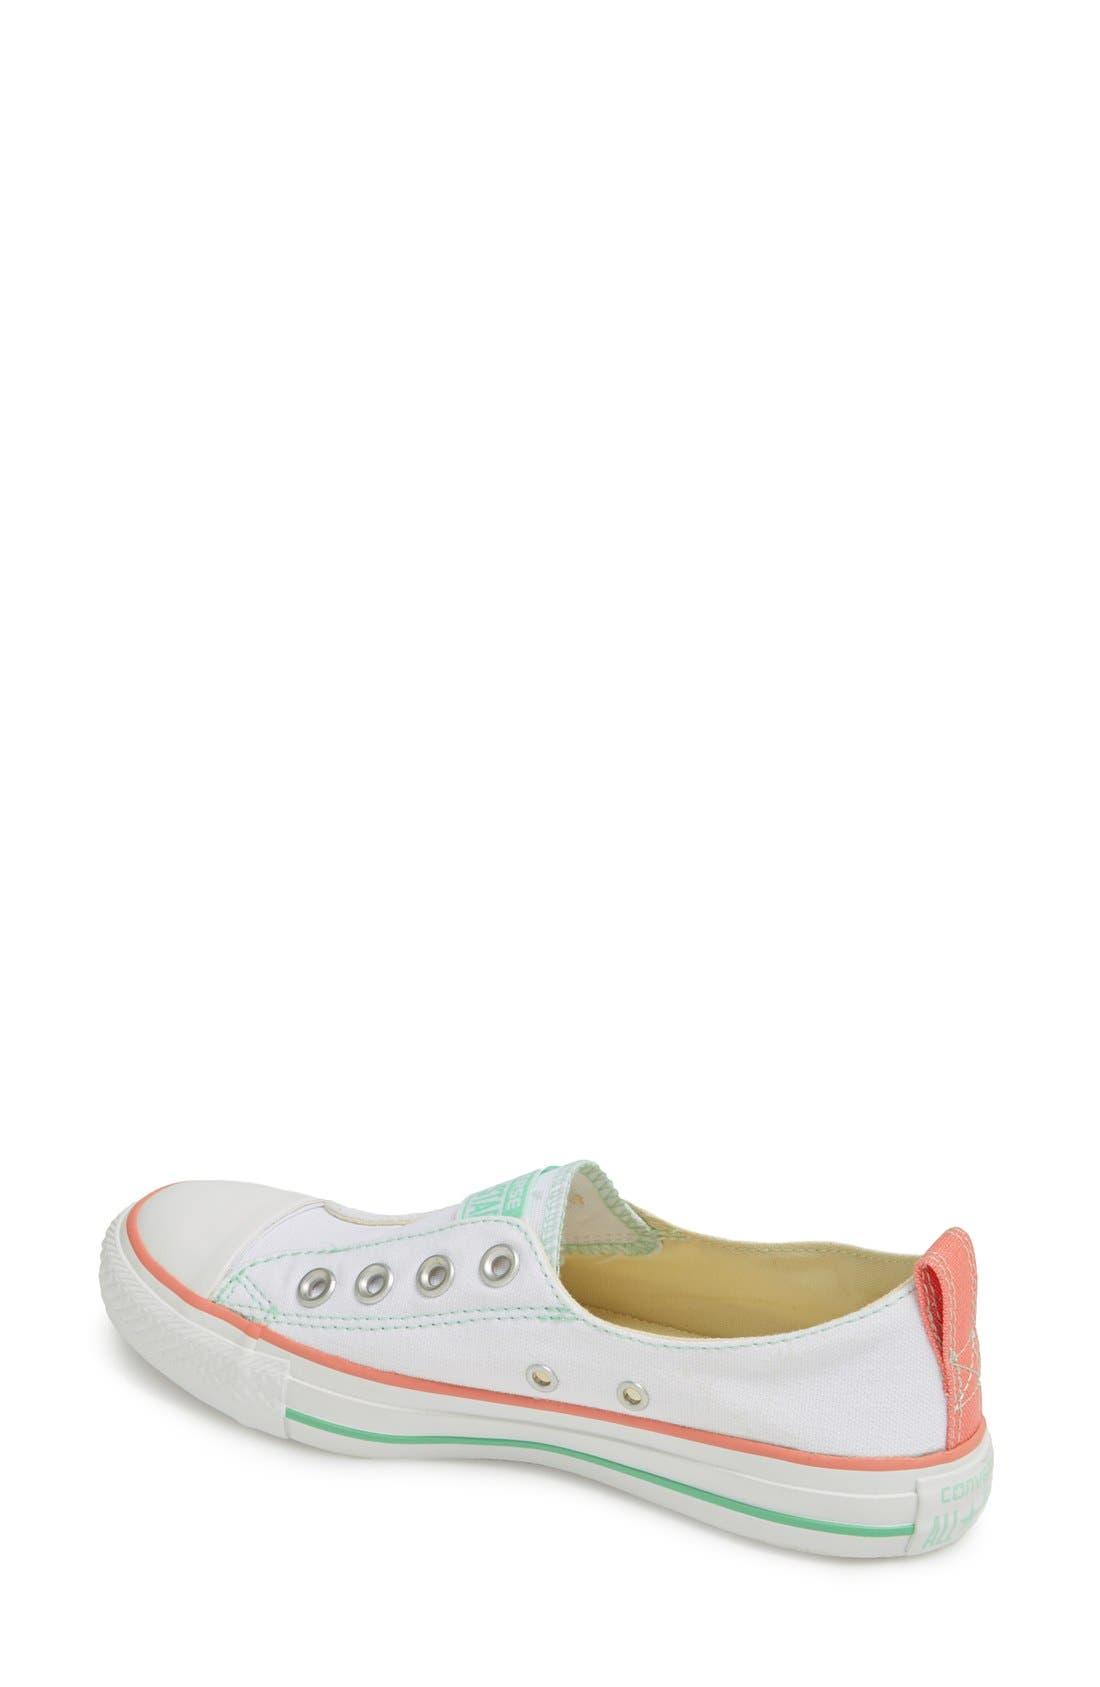 Alternate Image 2  - Converse Chuck Taylor® All Star® Laceless Slip-On Sneaker (Women)